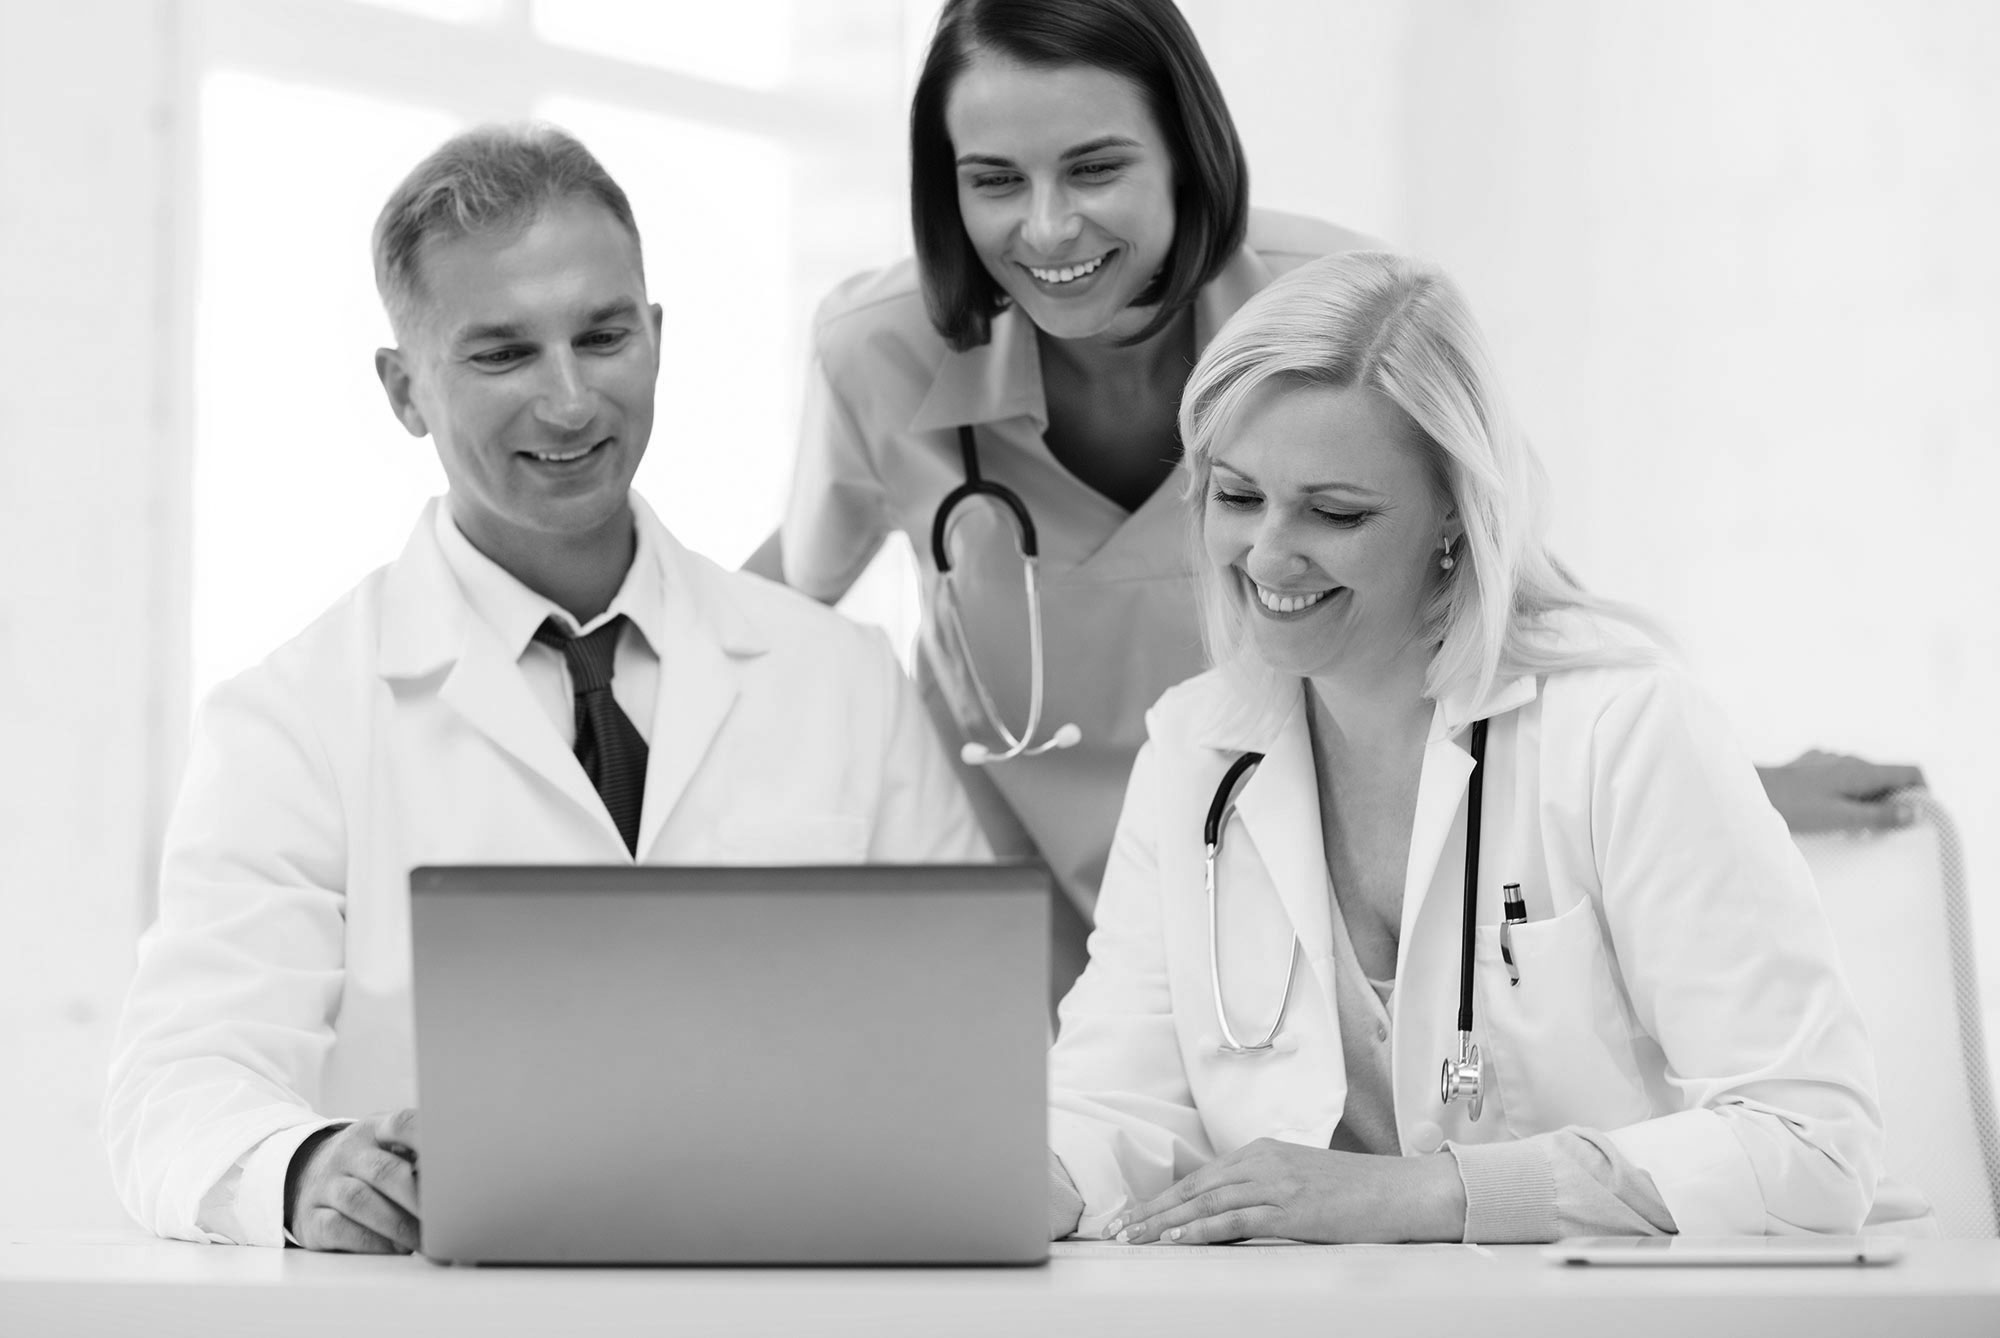 Surgery Center Regulatory Compliance Mock Survey Case Study